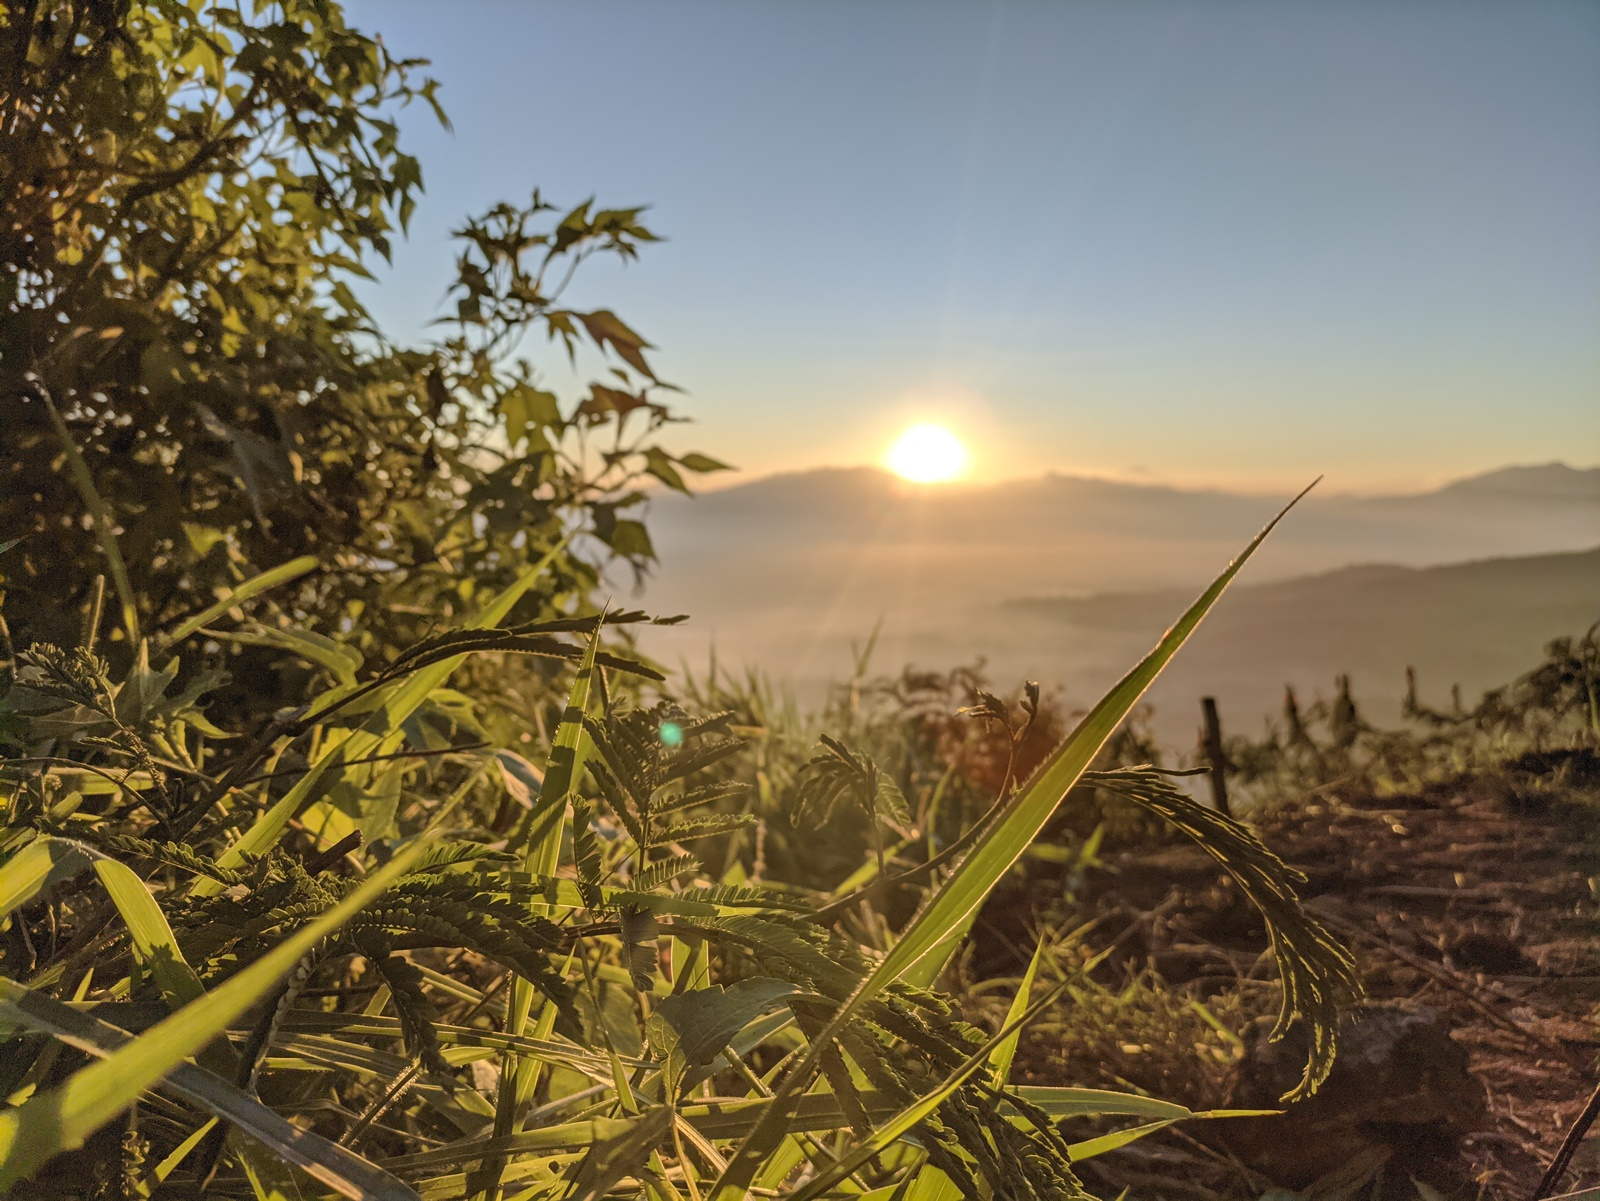 Cantiknya panorama sunrise